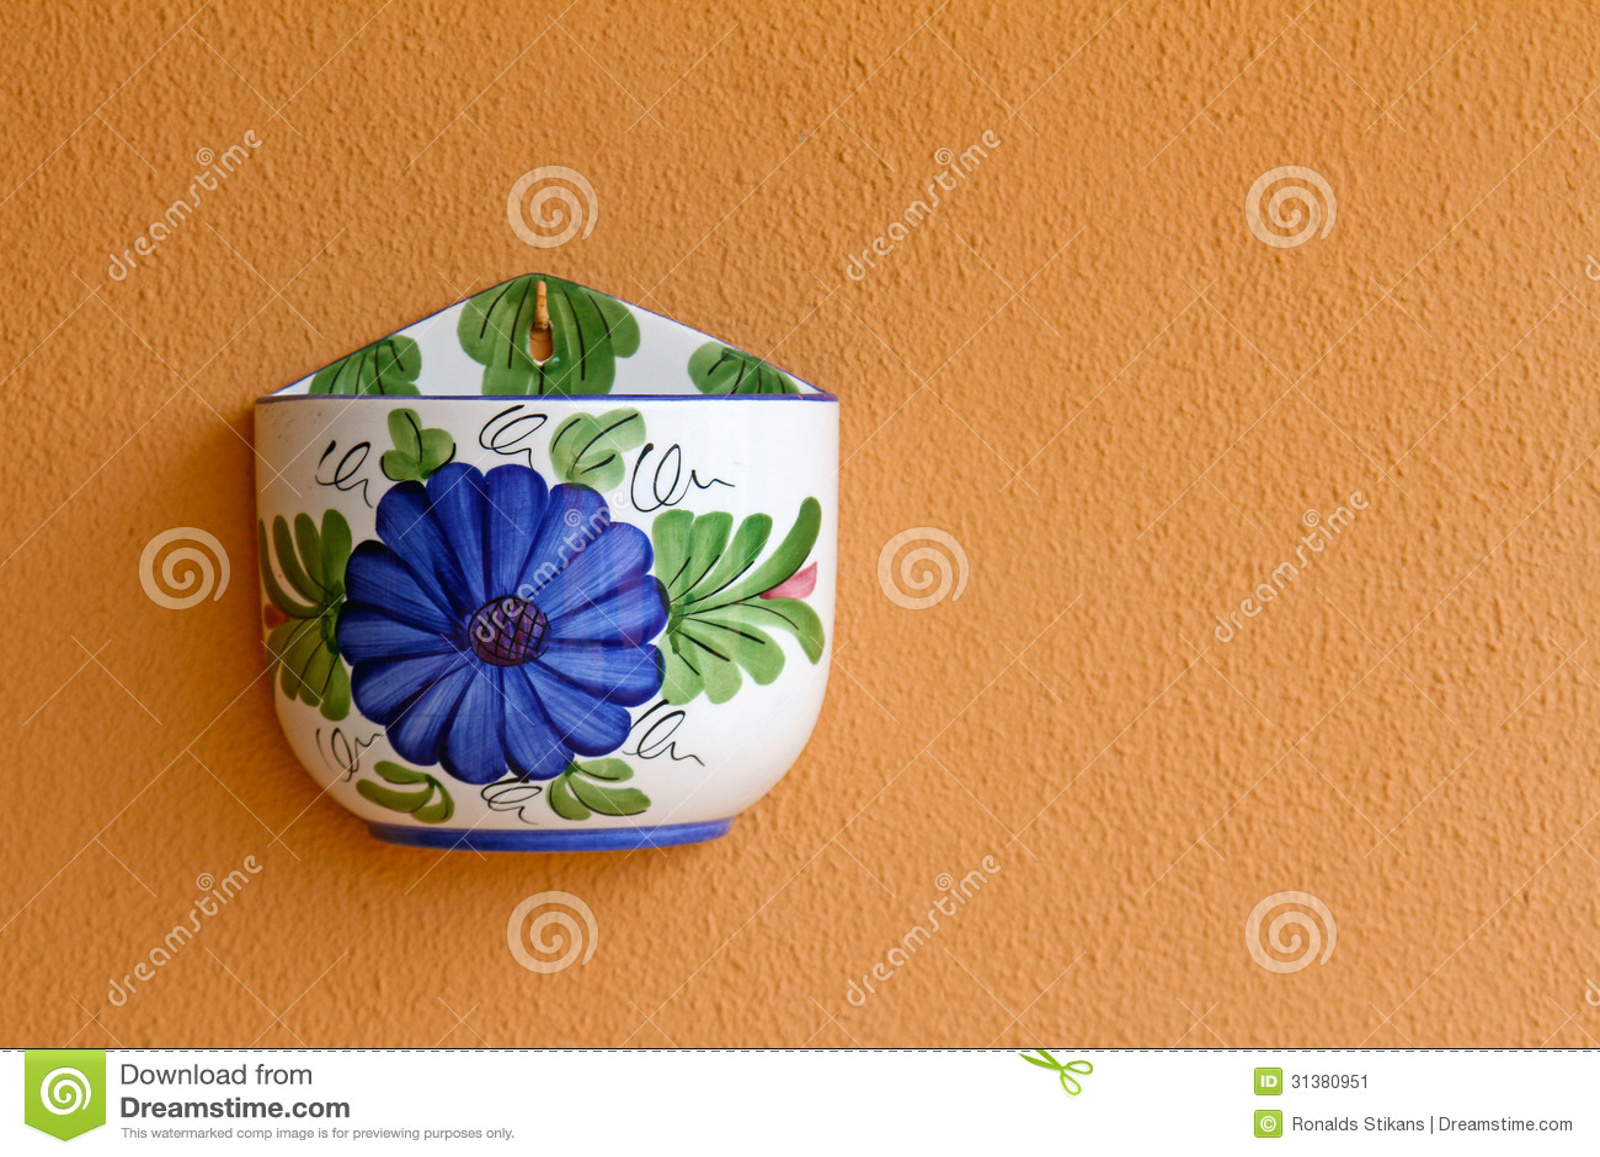 Leerer blumentopf auf orange wand stockbild bild 31380951 for Blumentopf wand